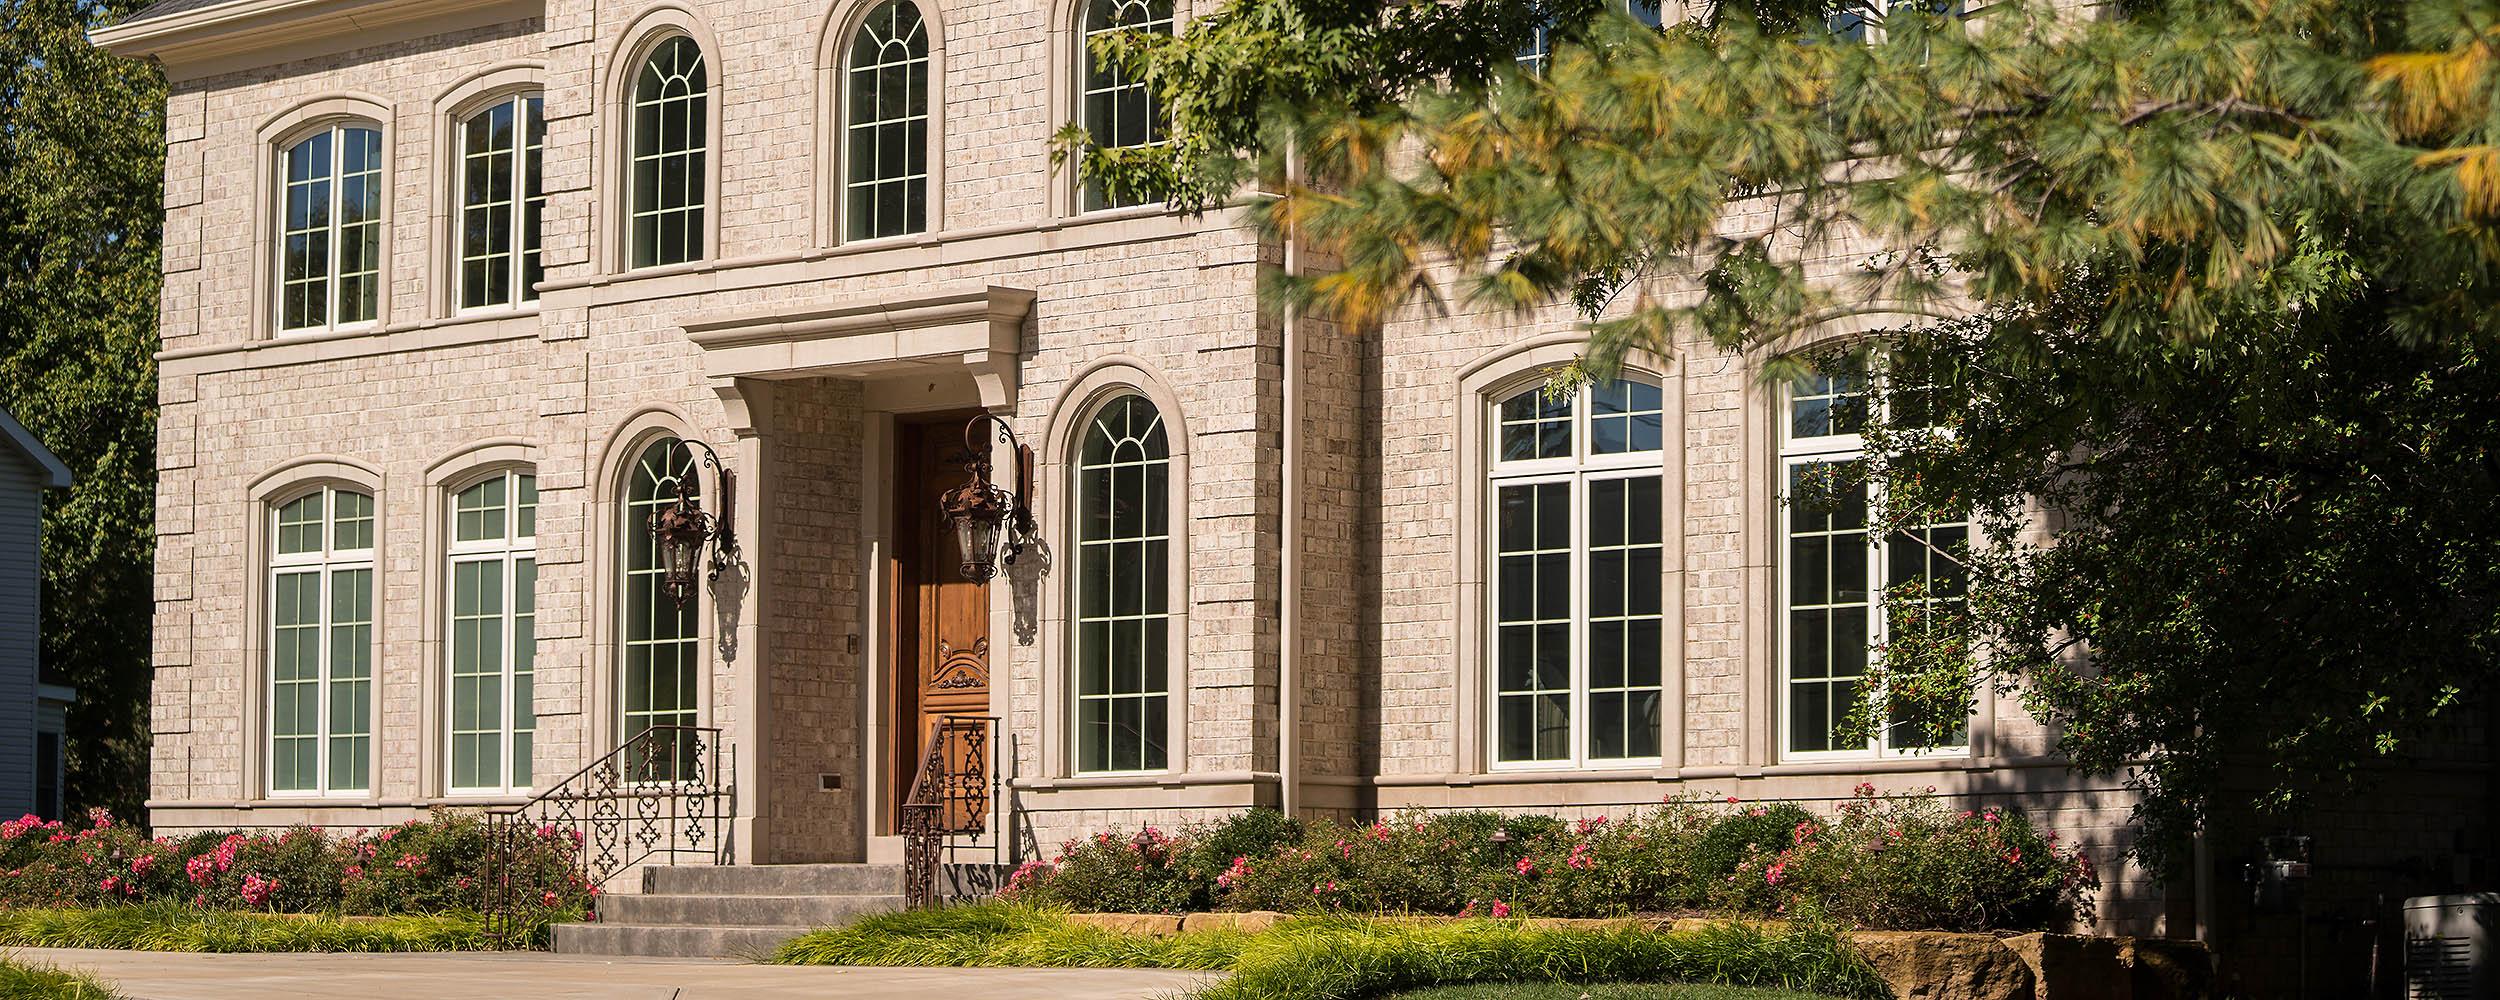 004-AFP-New-Custom-Luxury-Home